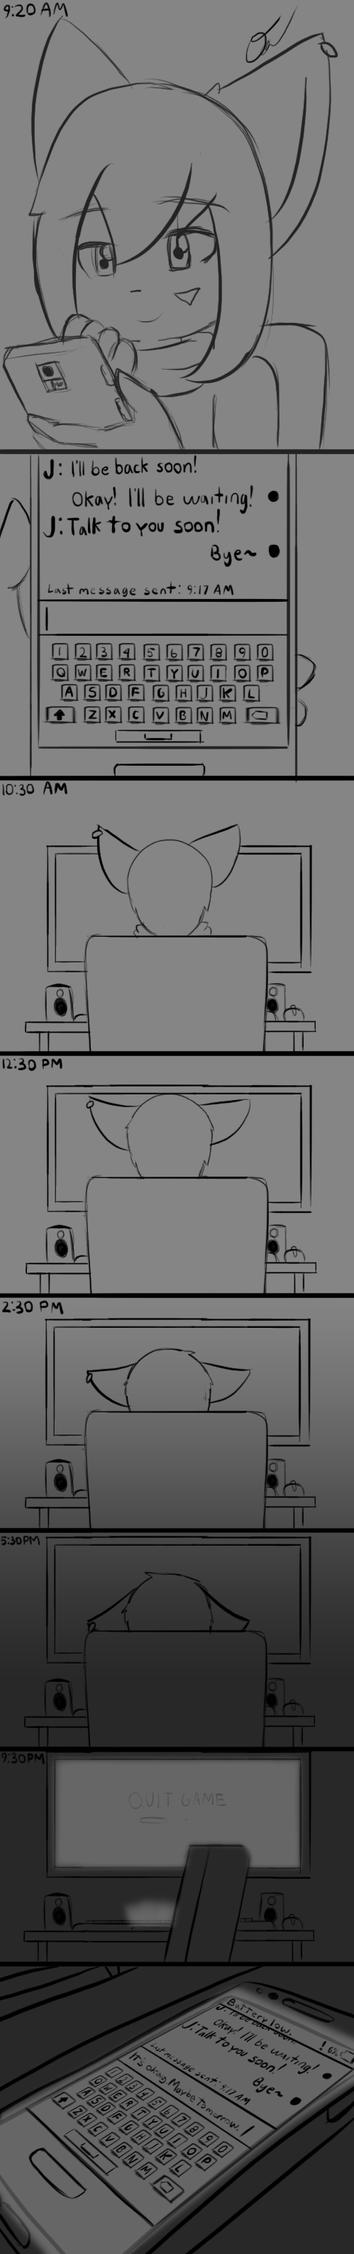 Short Comic - Waiting by Tukari-G3